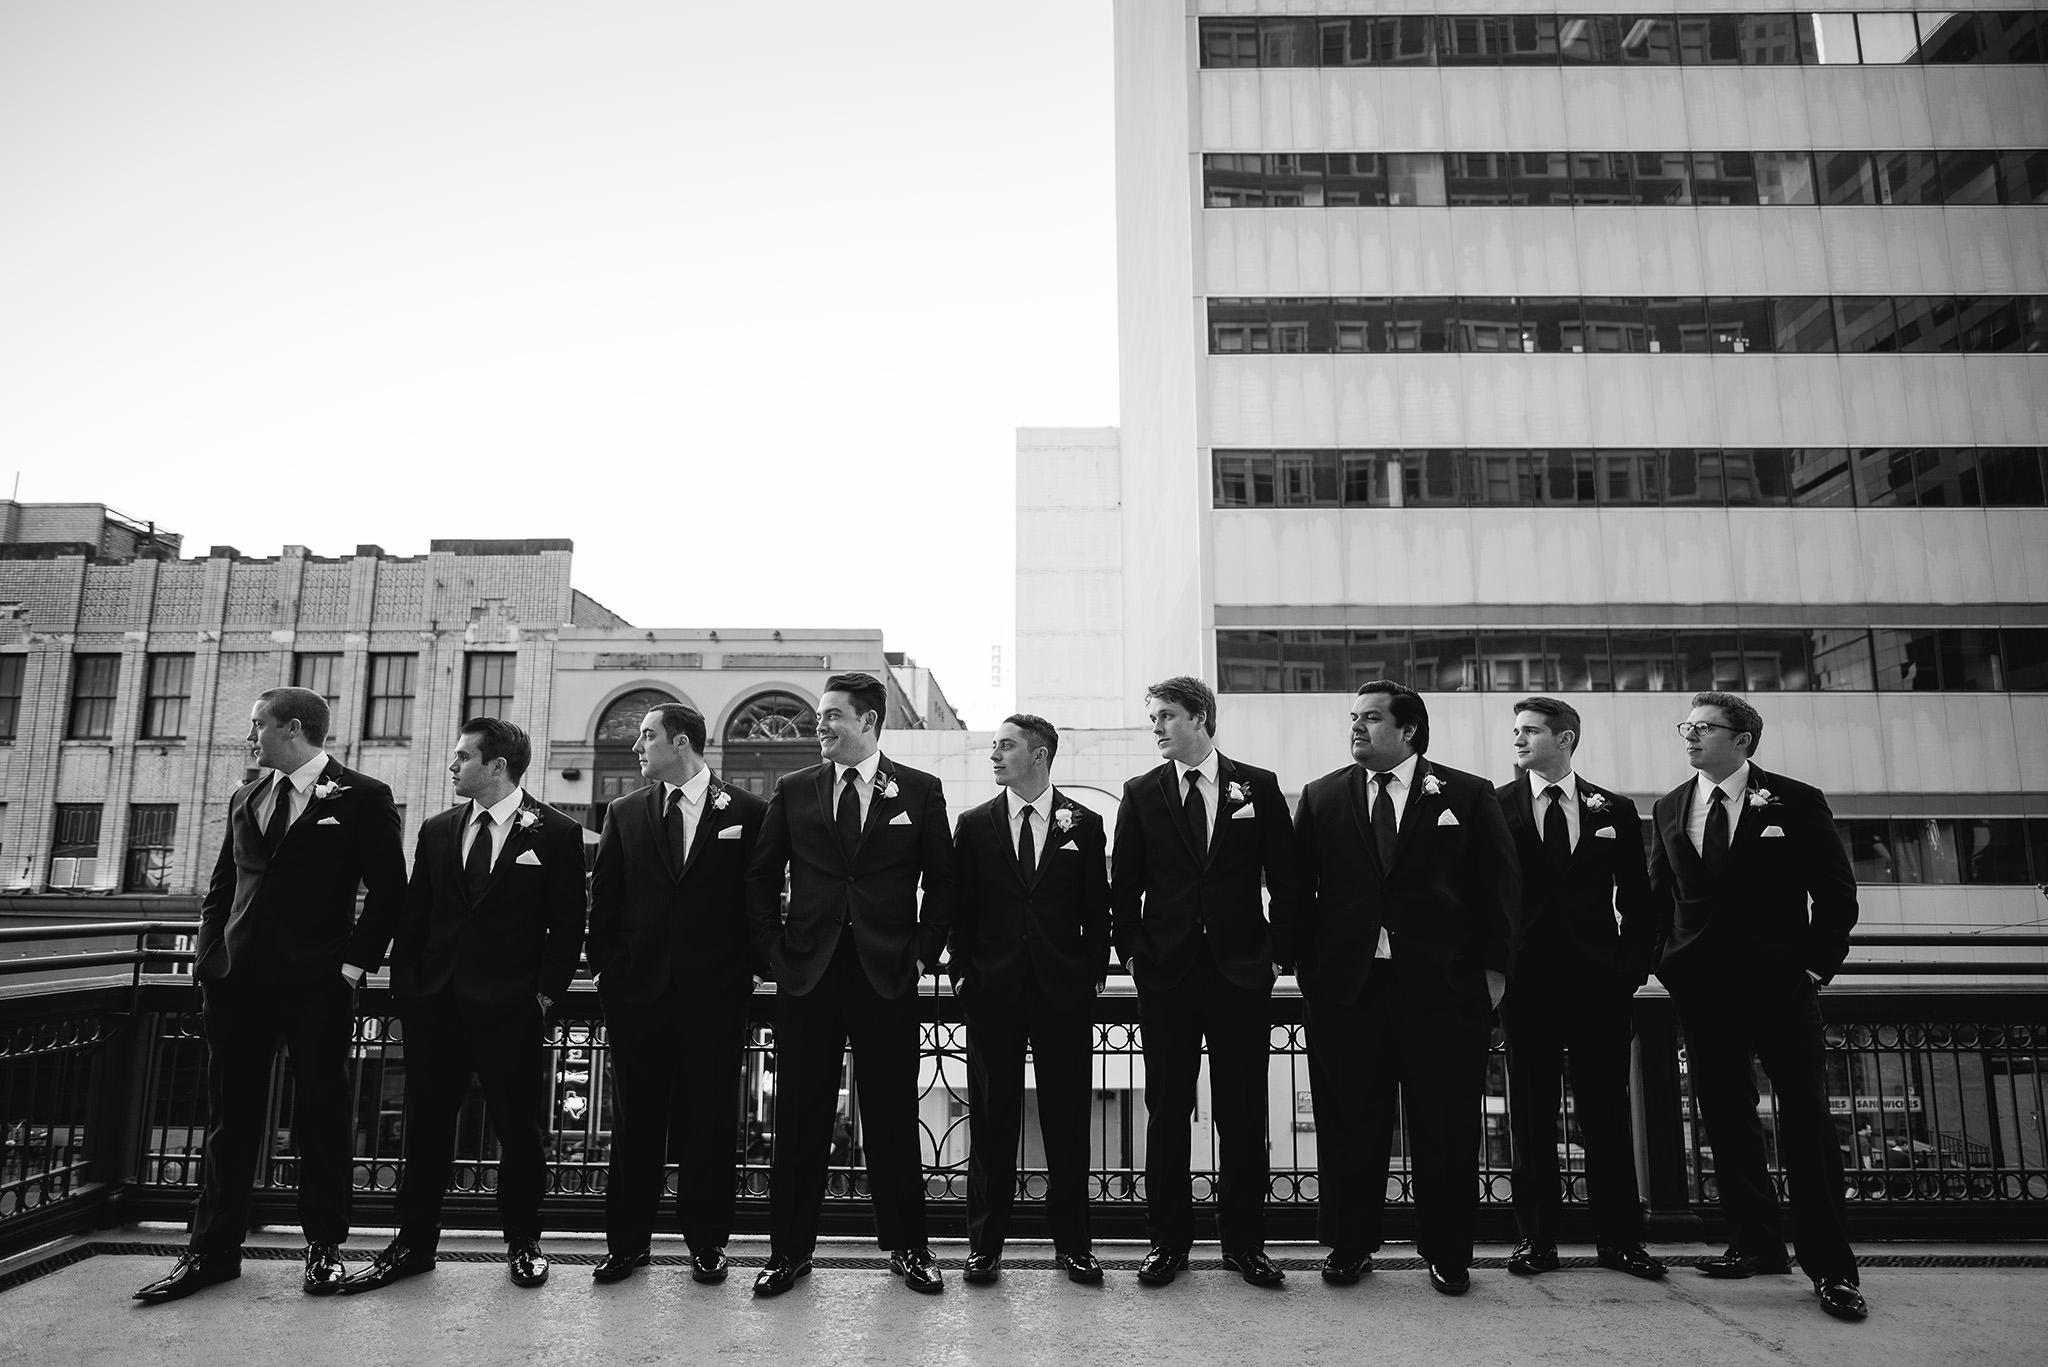 Claire-Travis-Classy-artistic-Downtown-Houston-Rice-ballroom-wedding-sm-007.jpg